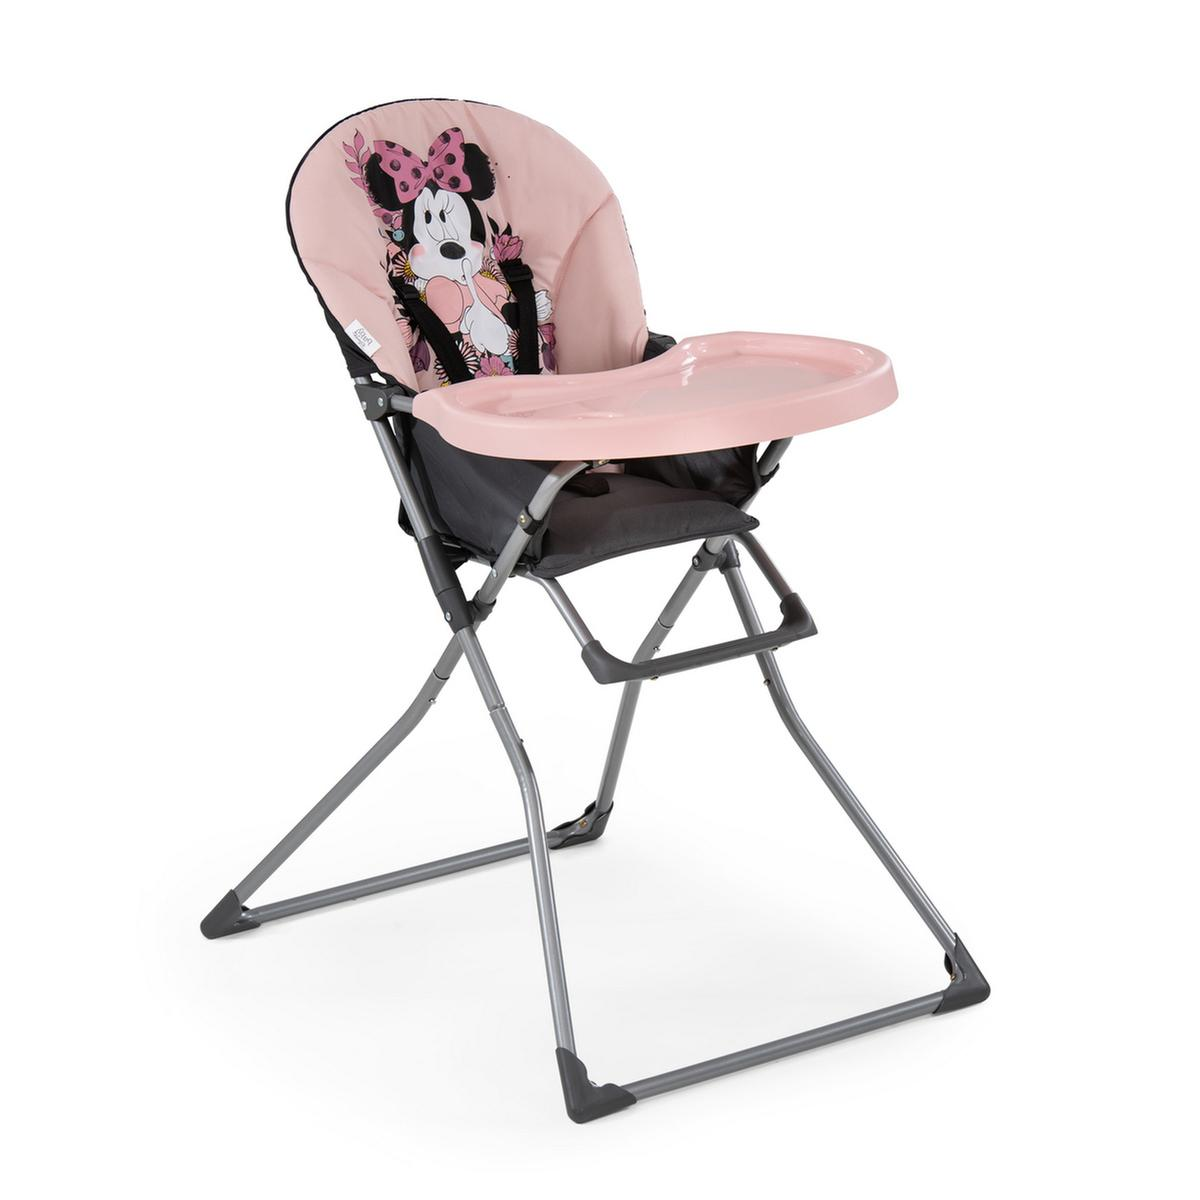 silla plegable bebe mini